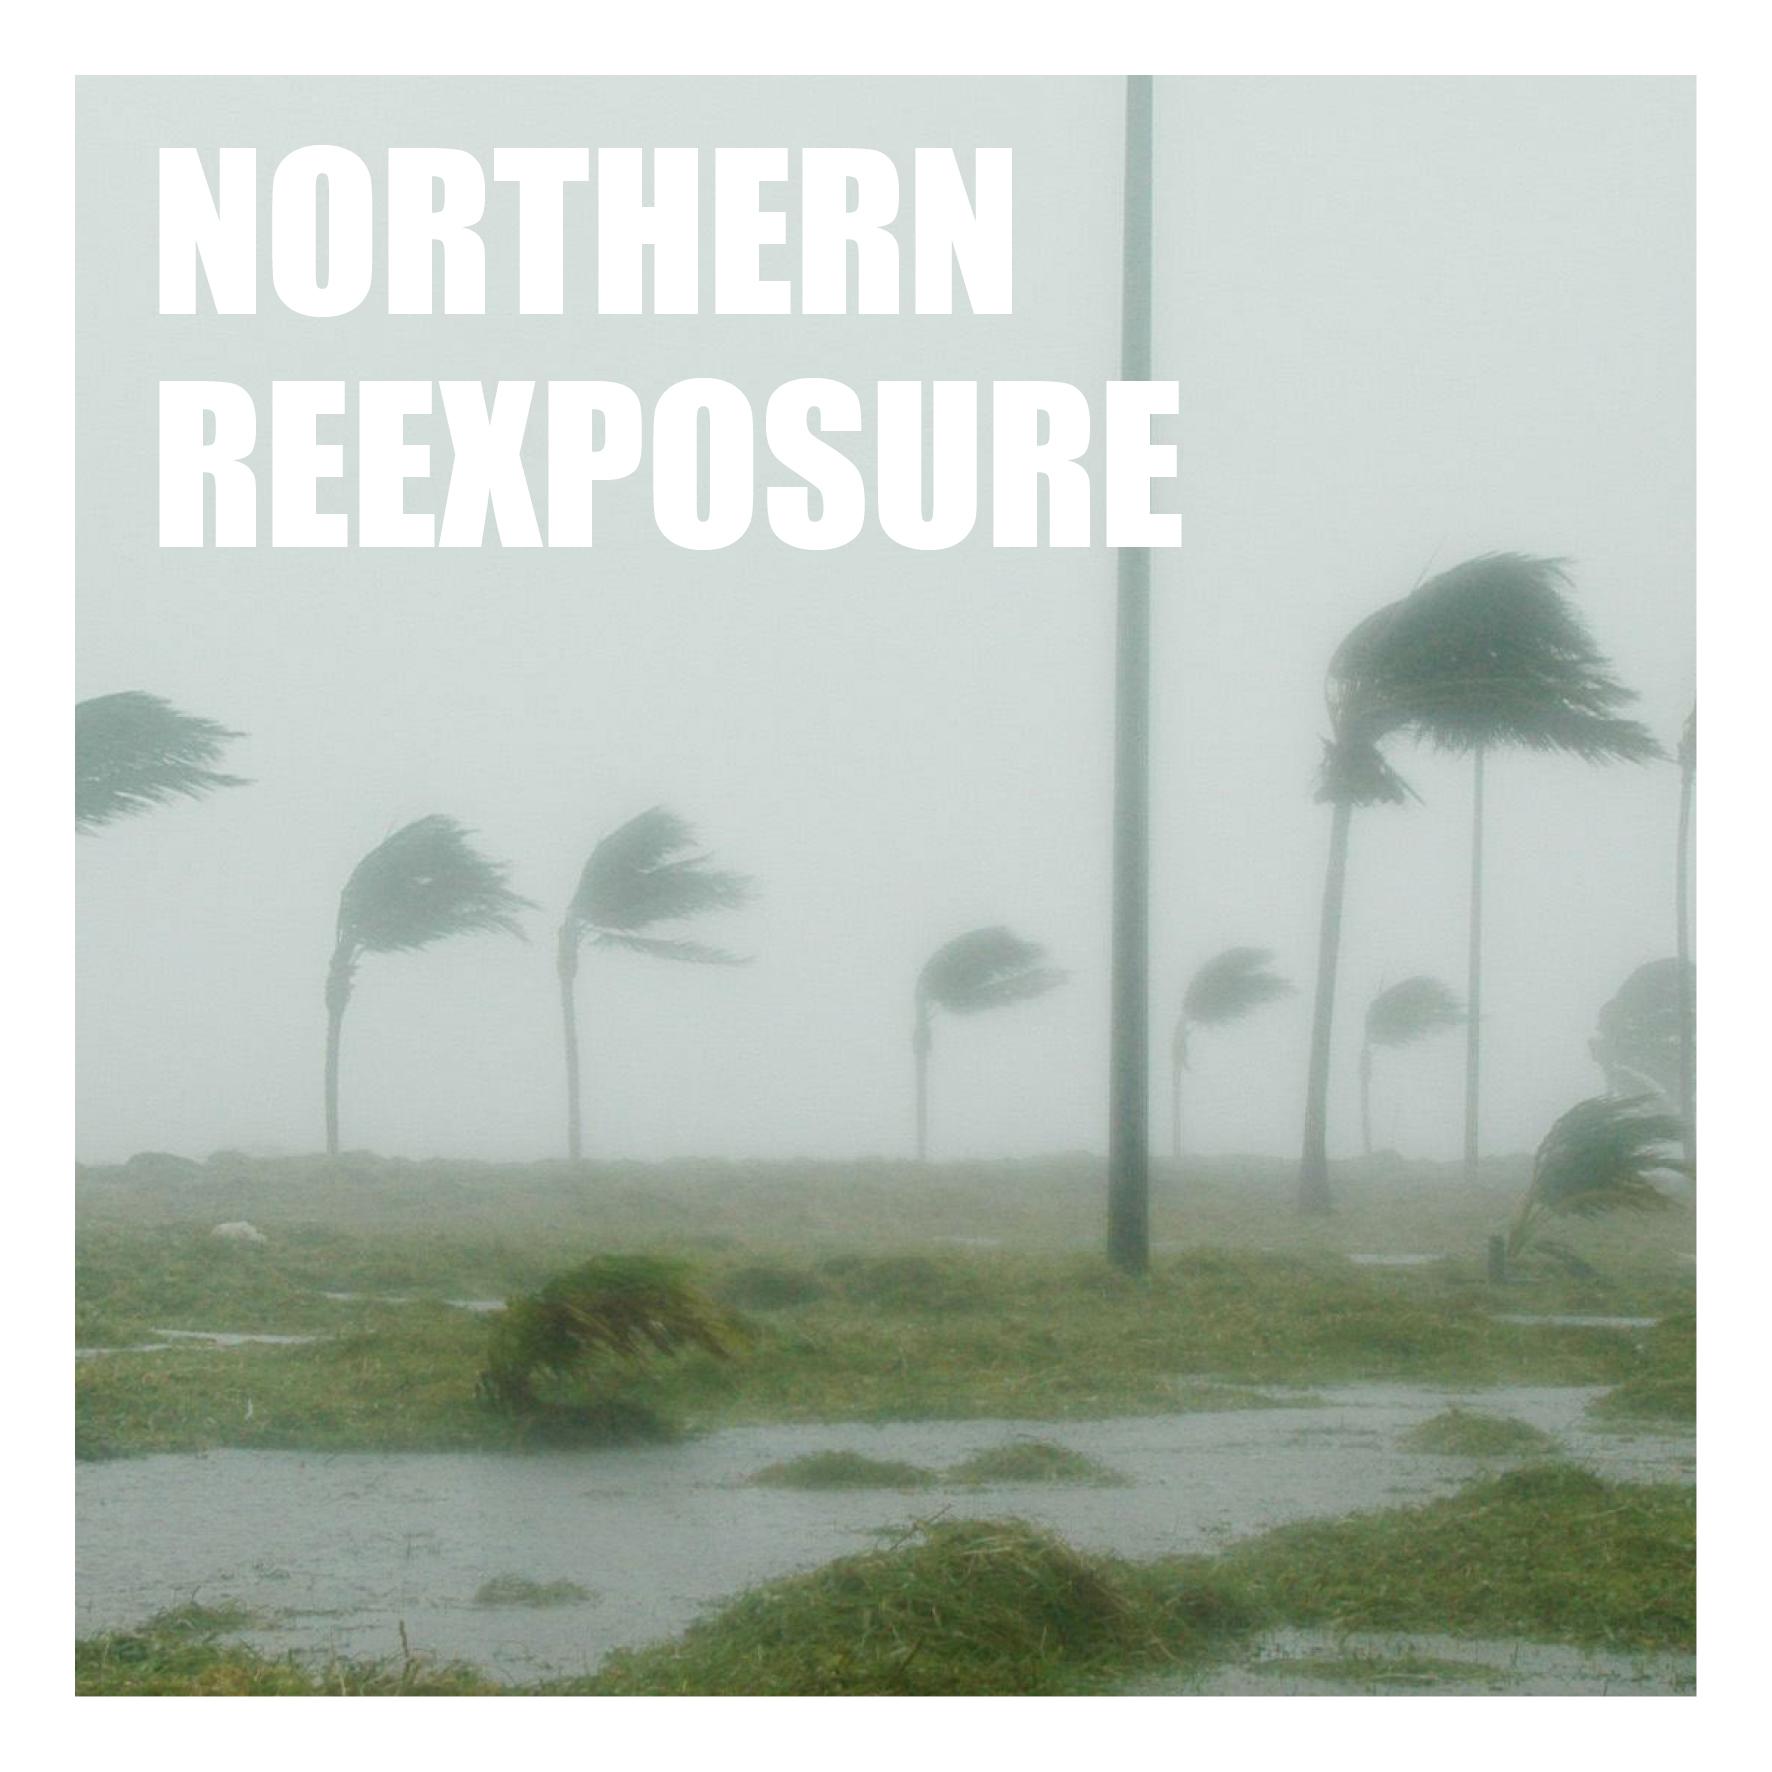 Album Stream: Northern Reexposure – Various Artists